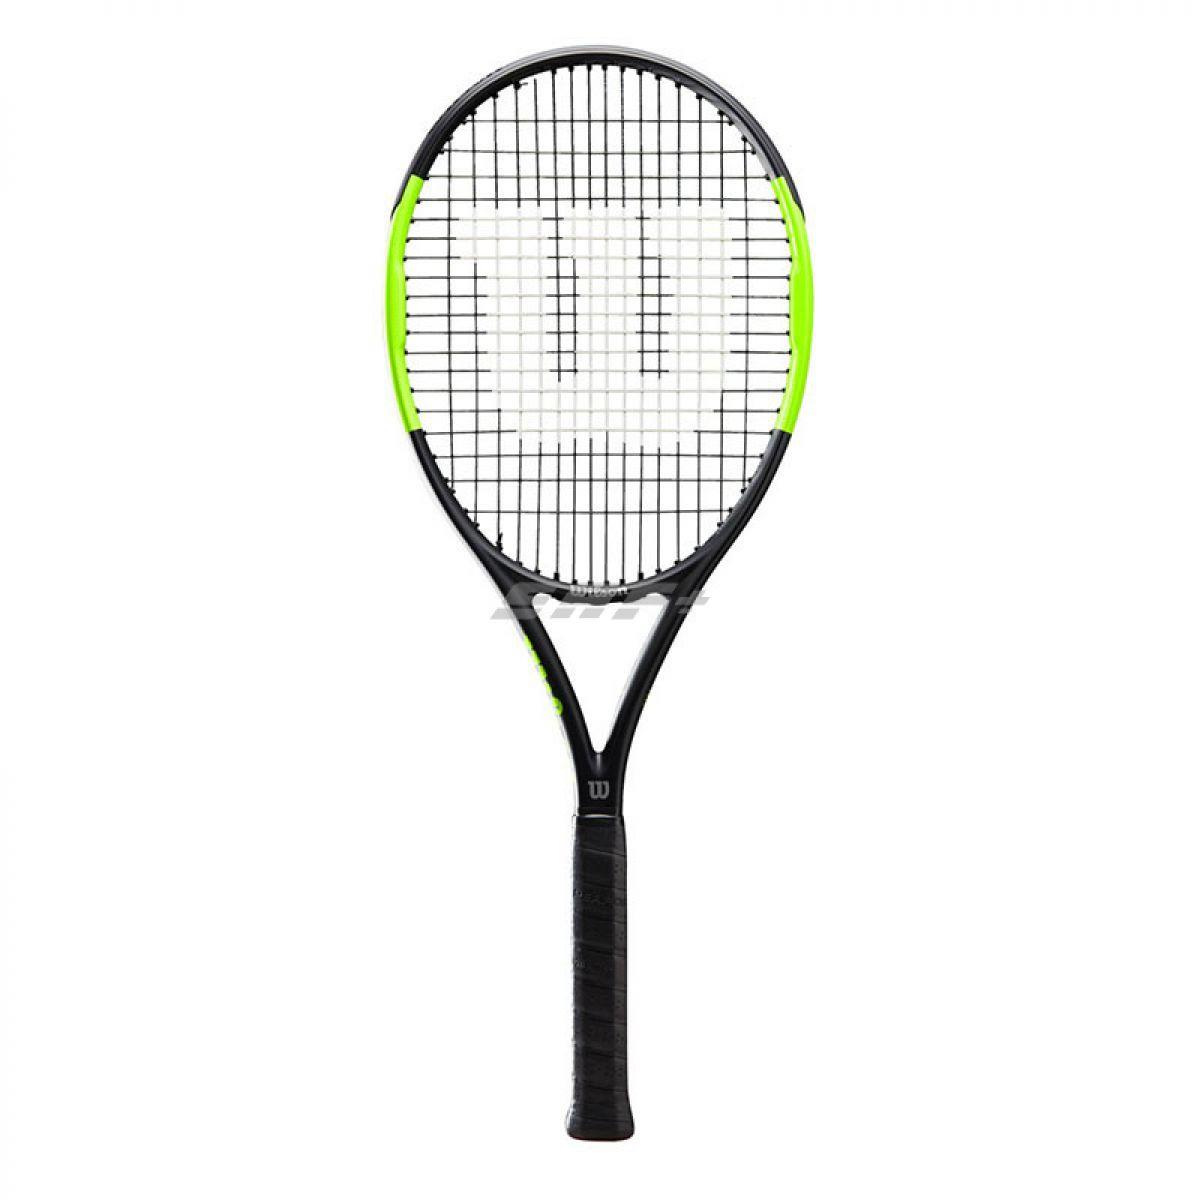 Ракетка теннисная Ракетка б/т Wilson Blade Feel Team, артWR018910U3, для любителей, со струнами, черно-зелен